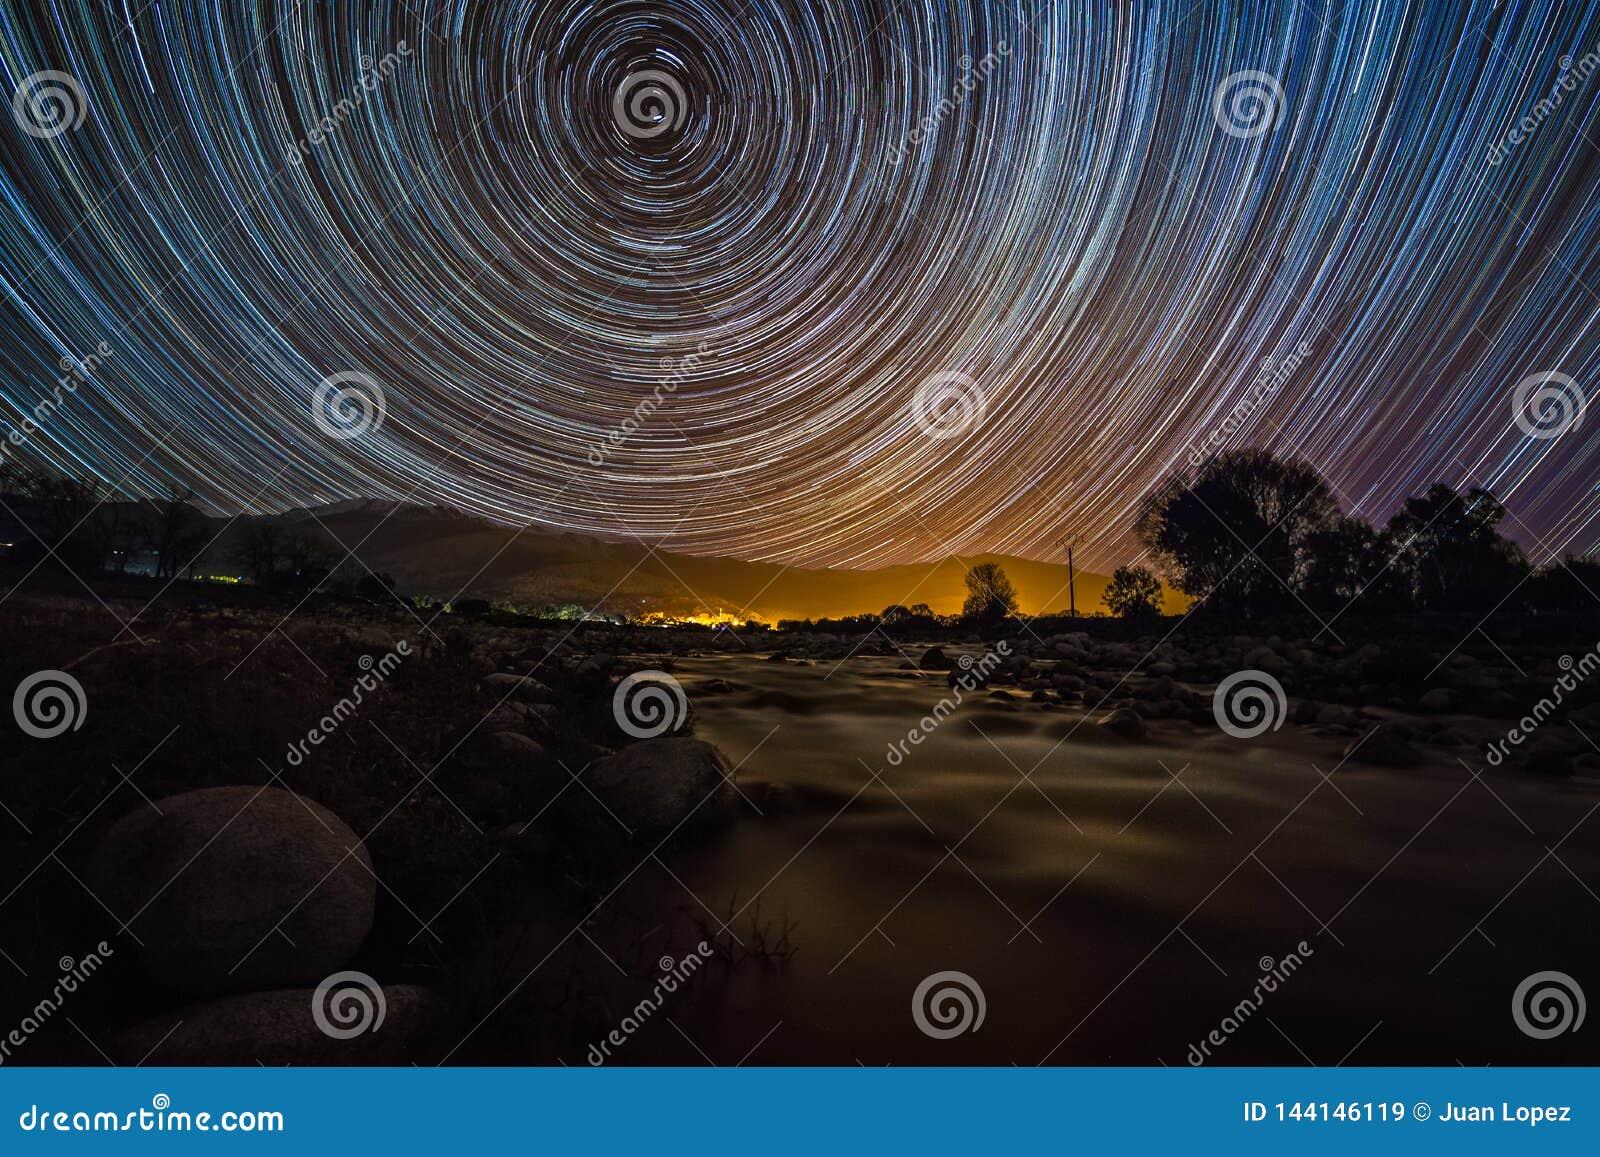 Star Trail over Gredos